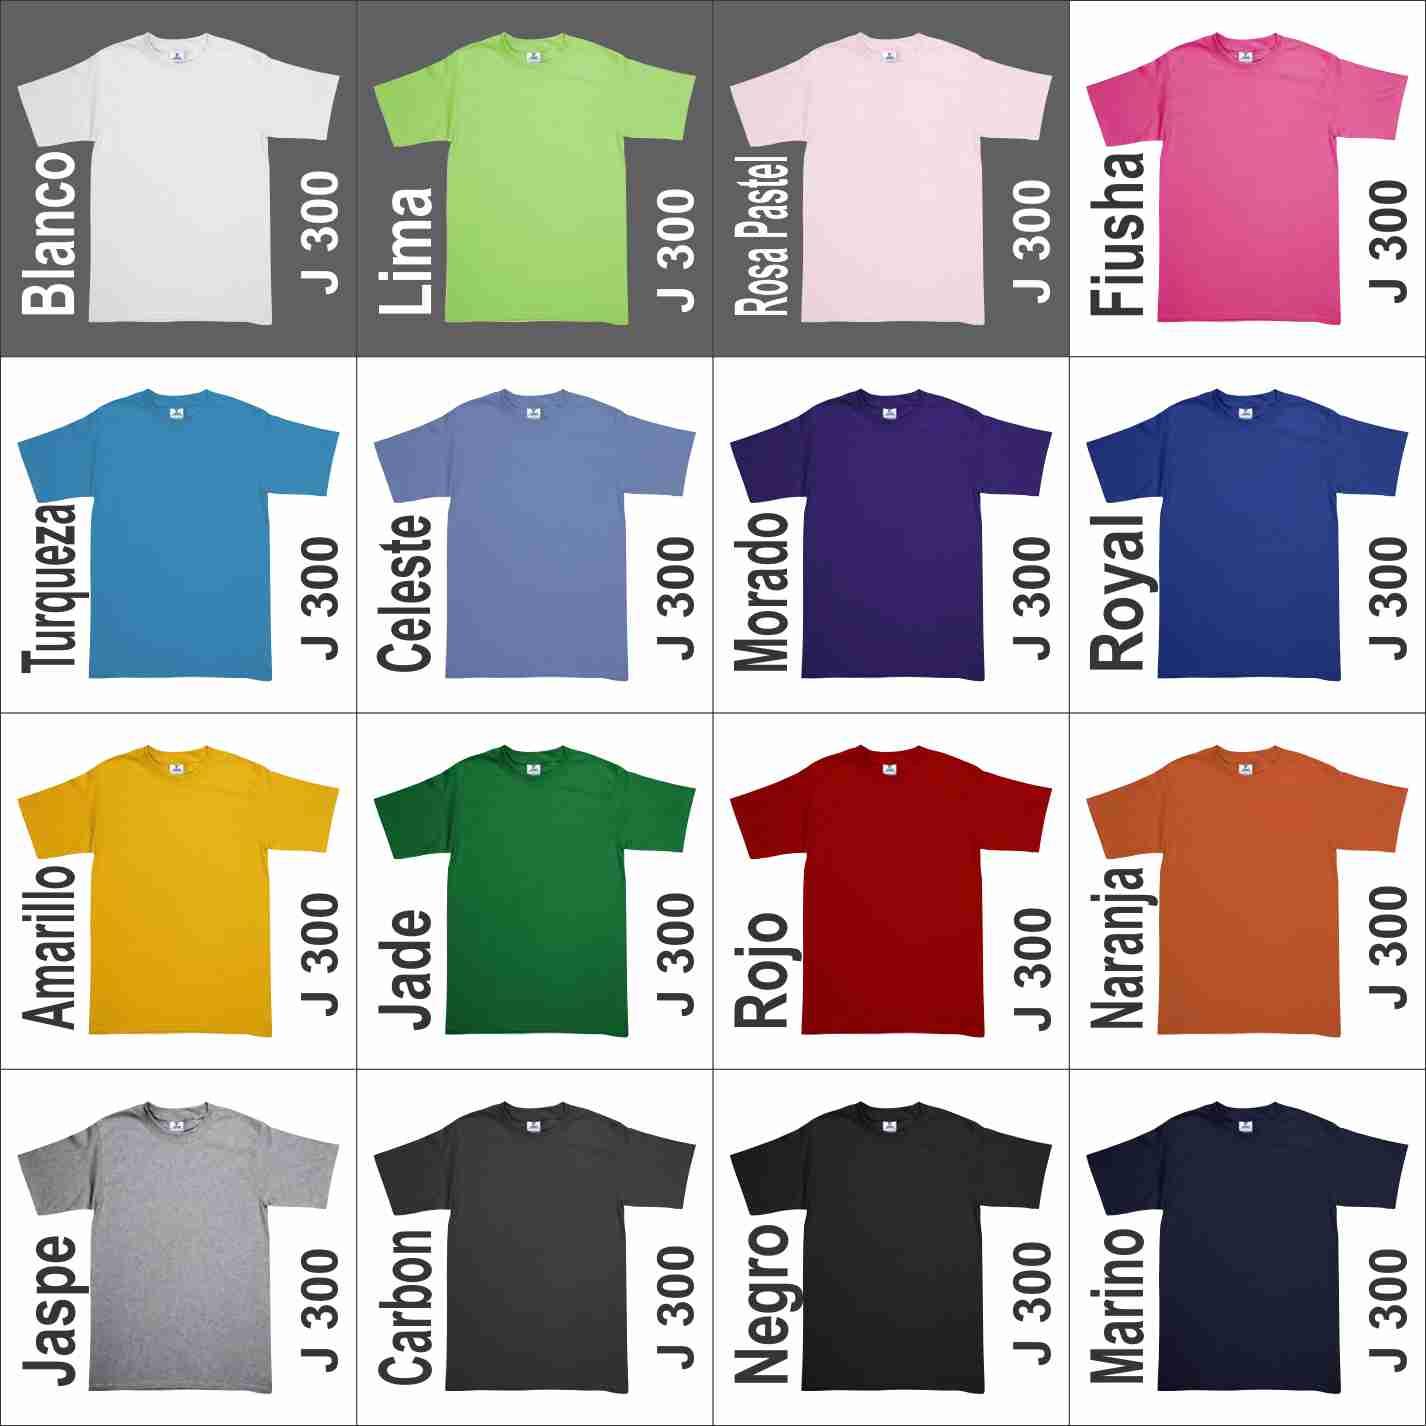 319859870a230 Playera Yazbek Peso Completo Joven J300 Colores